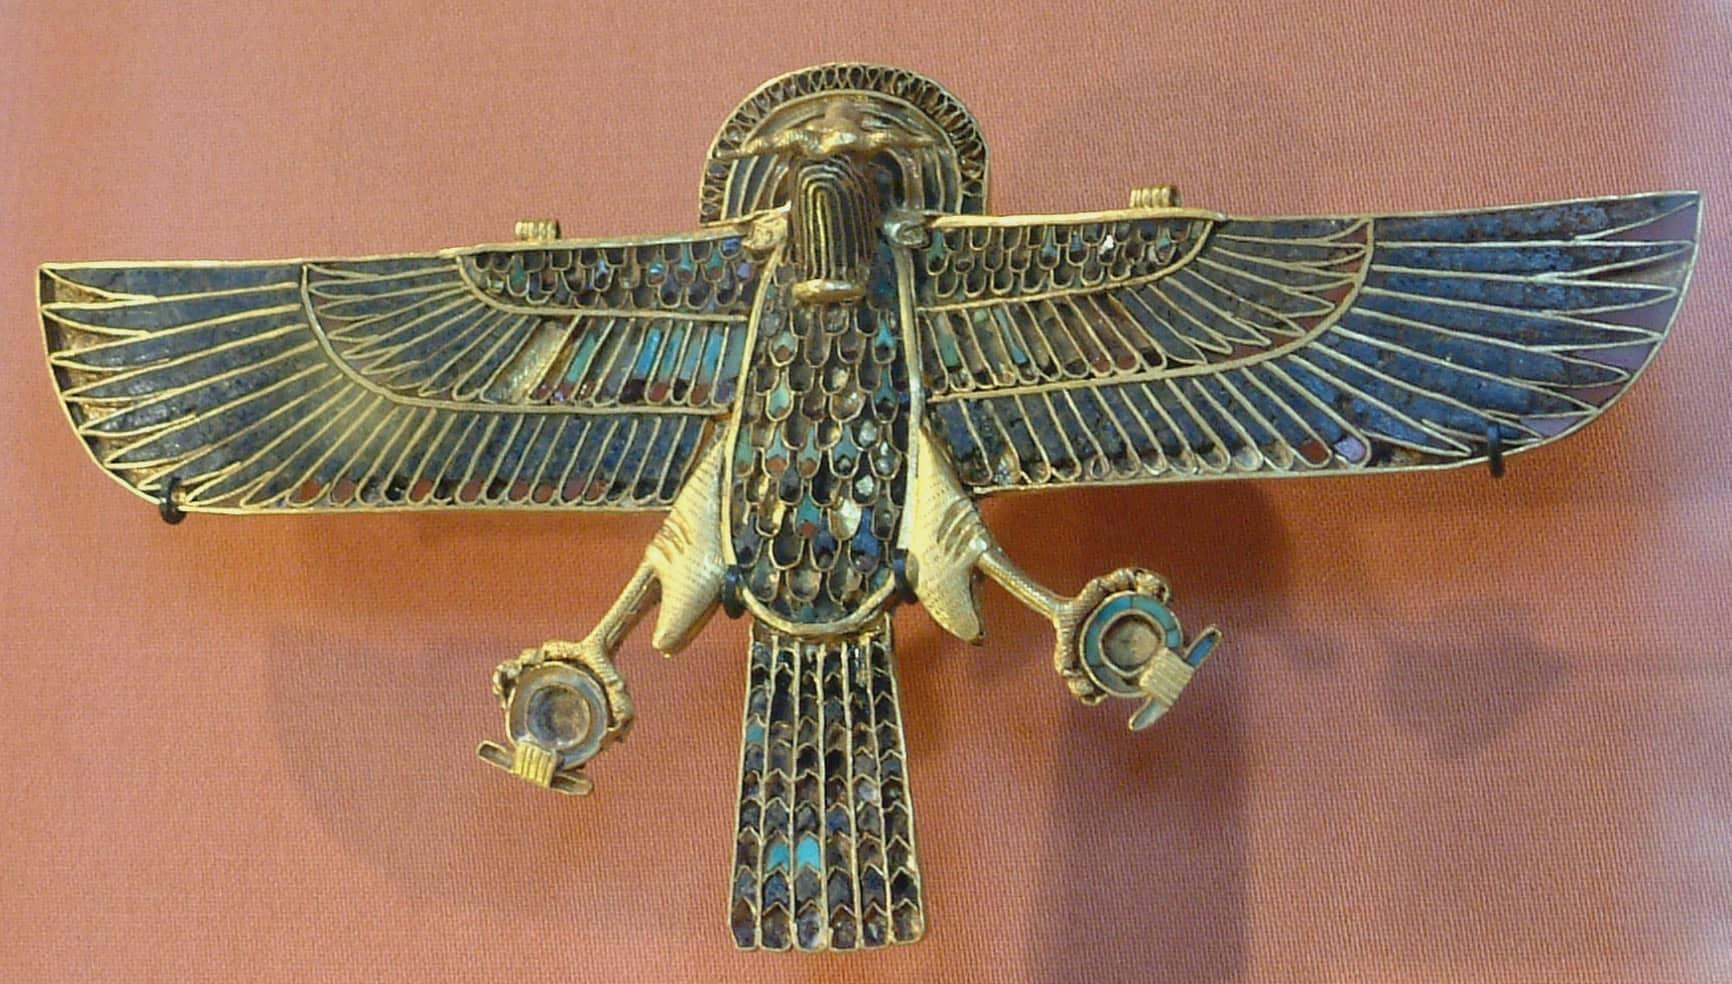 Wikipedia (Conflict between Horus and Set)